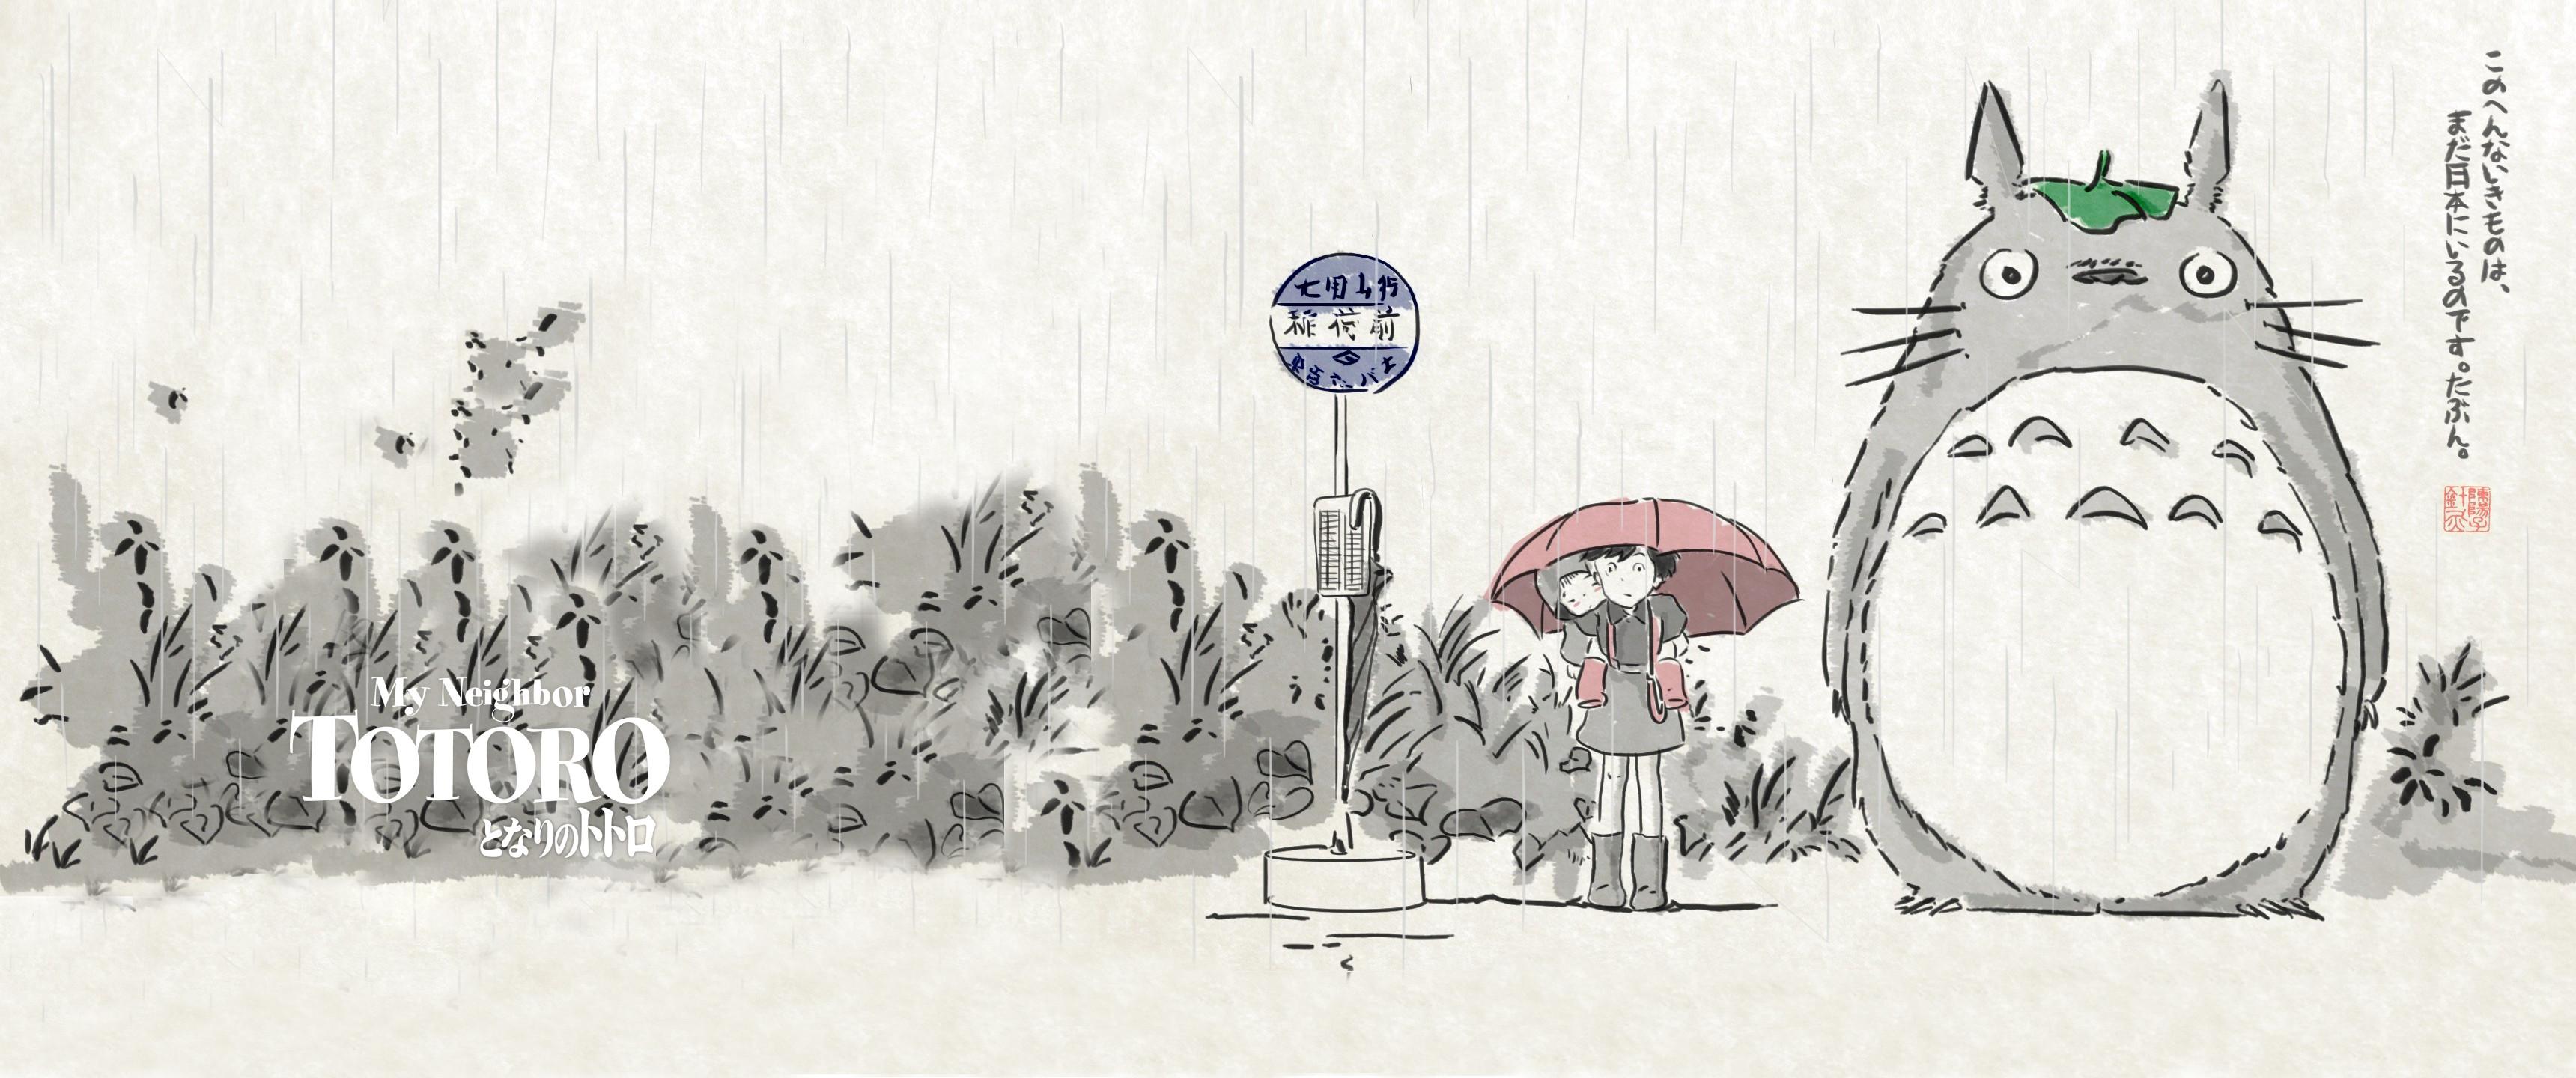 … Totoro Calligraphy Wallpaper (3440 x 1440p) by Sendigo